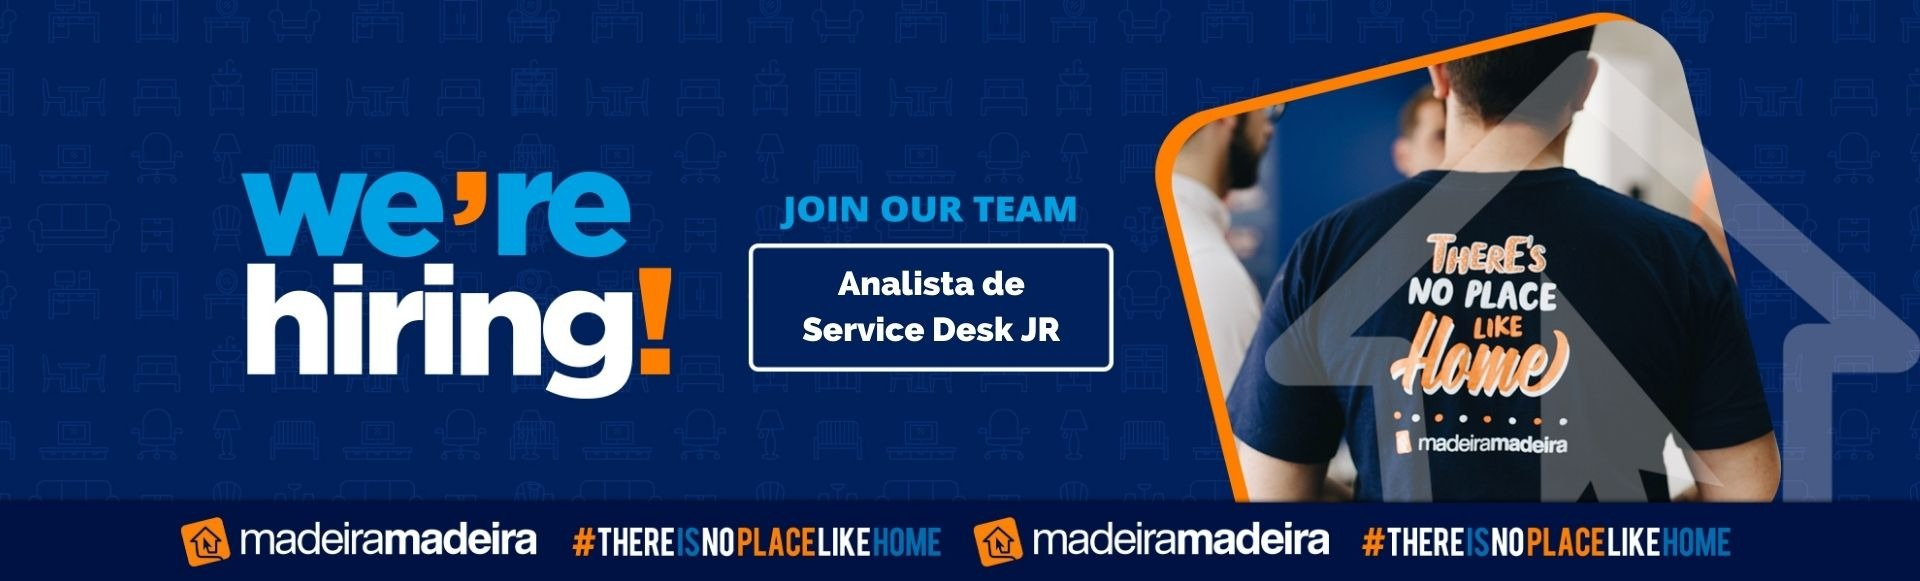 Analista de Service Desk JR